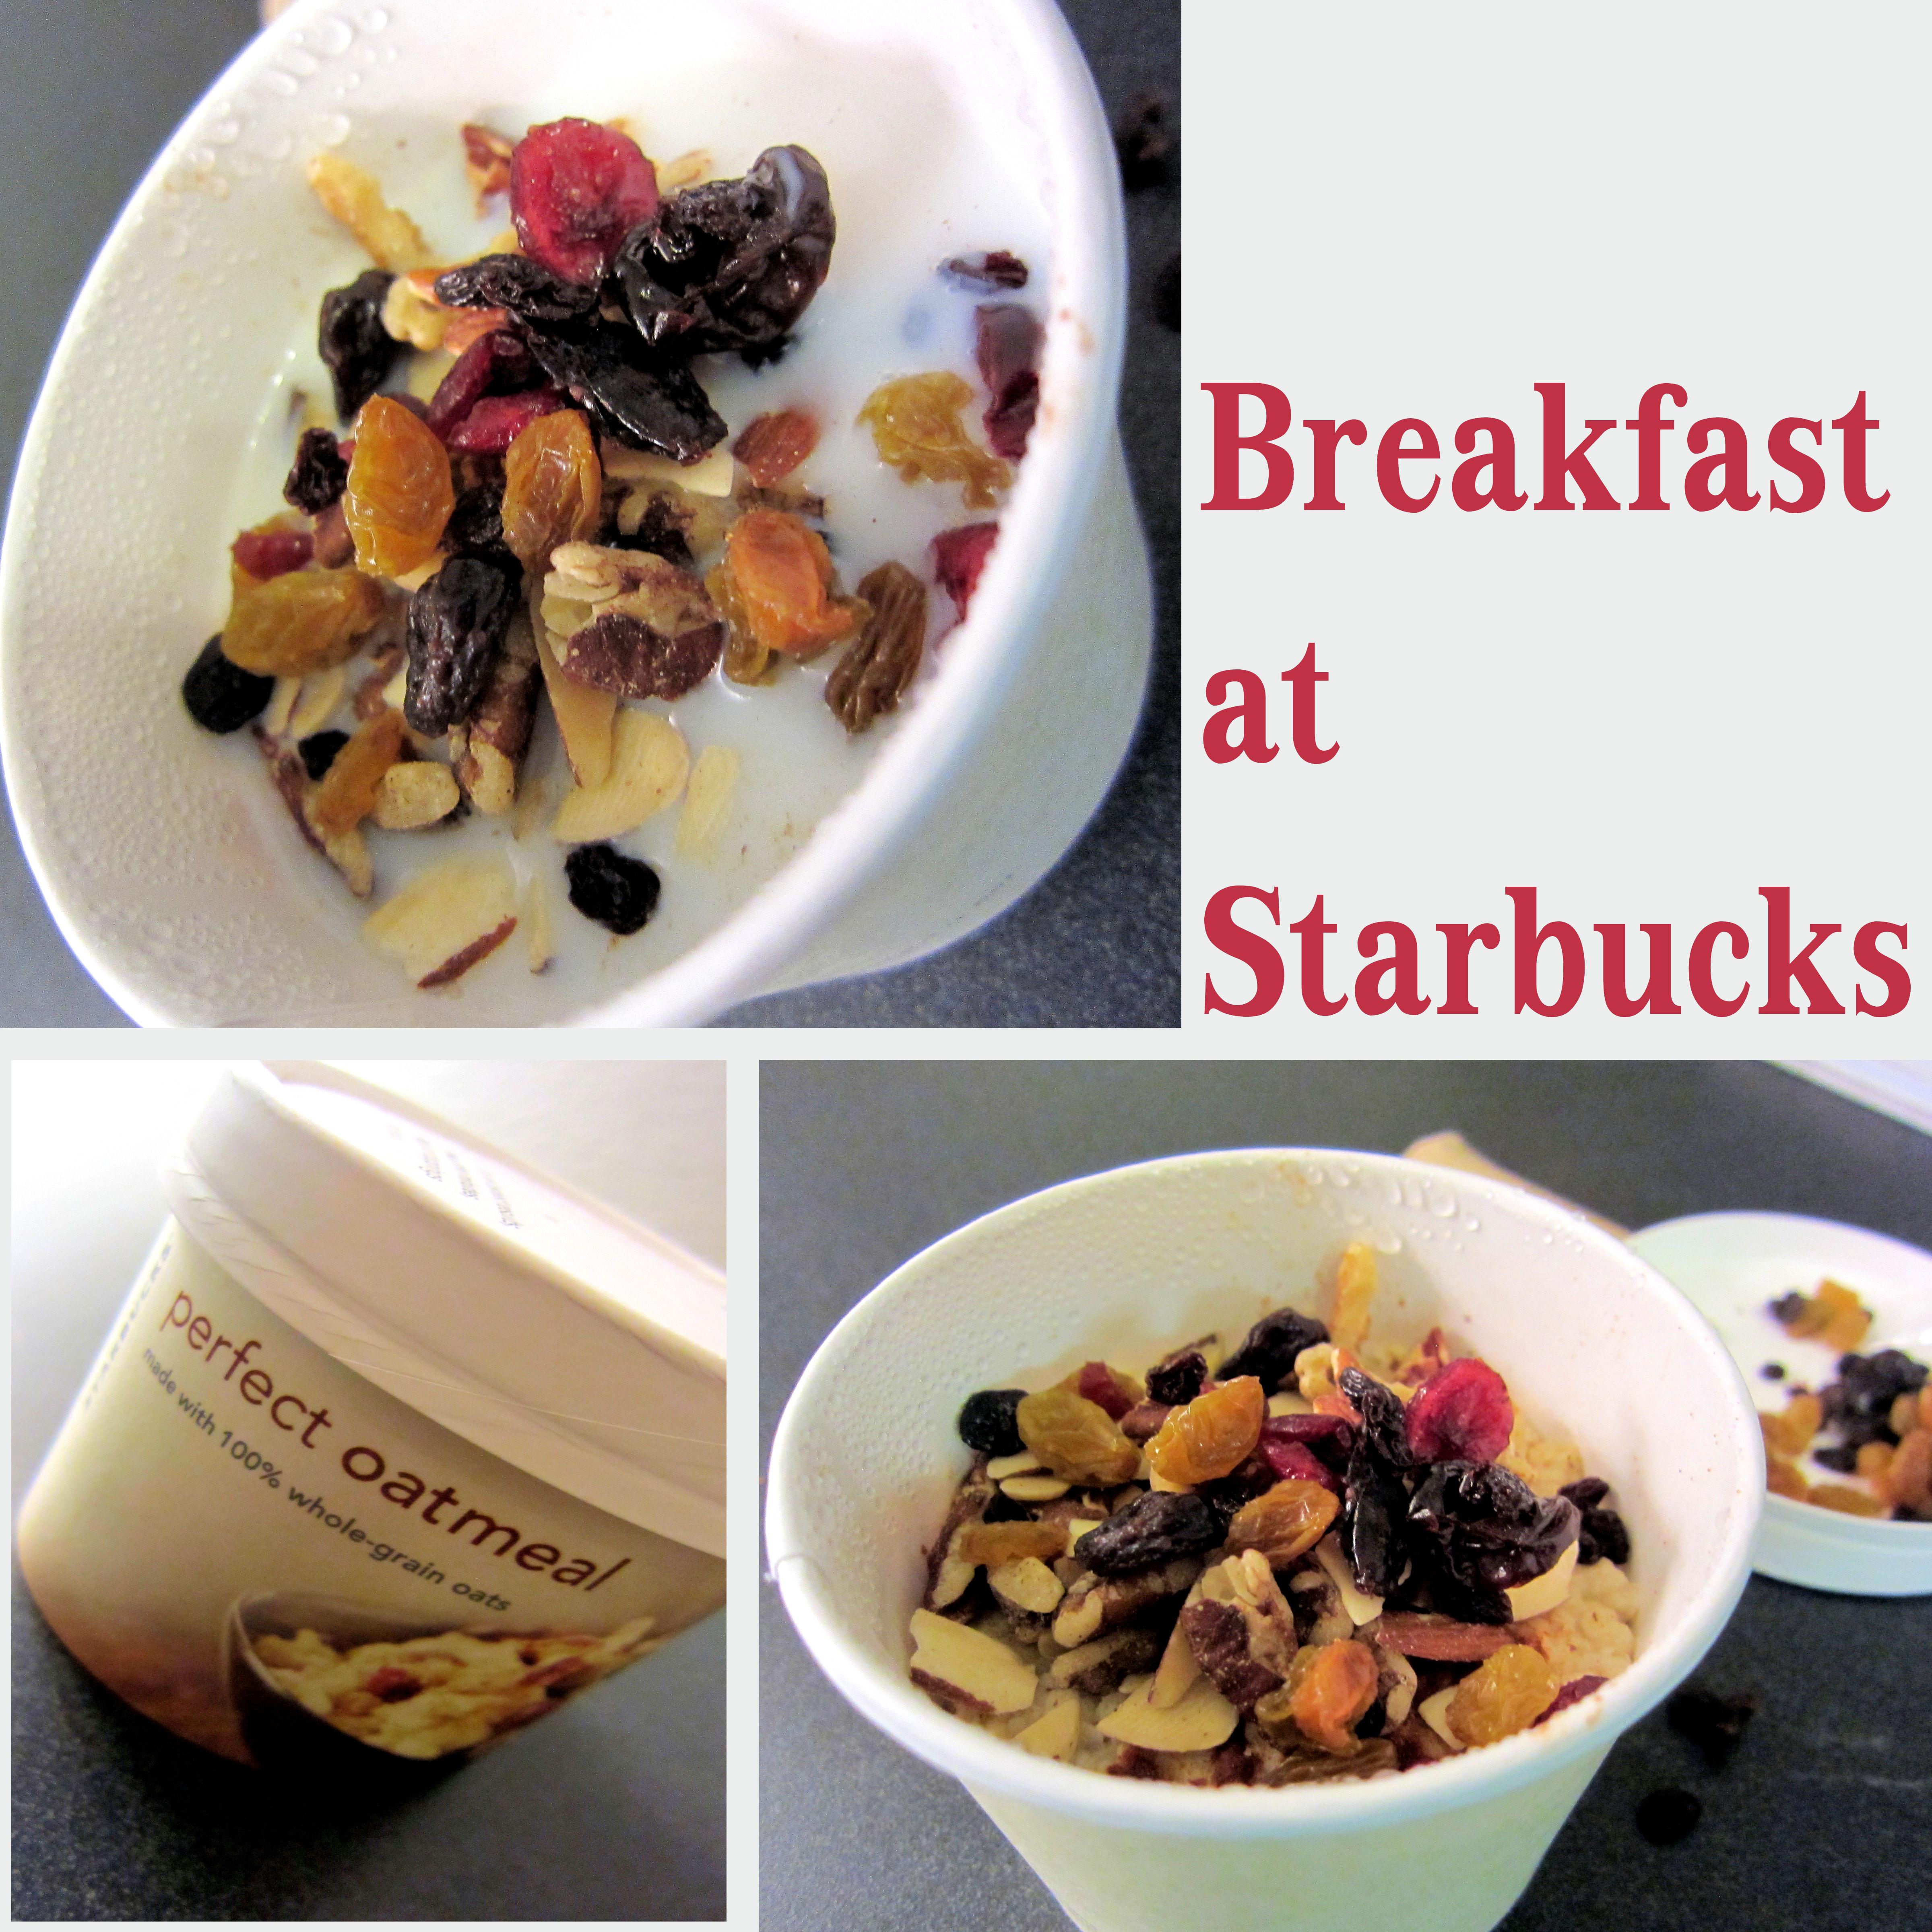 Healthy Starbucks Breakfast  Breakfast at Starbucks